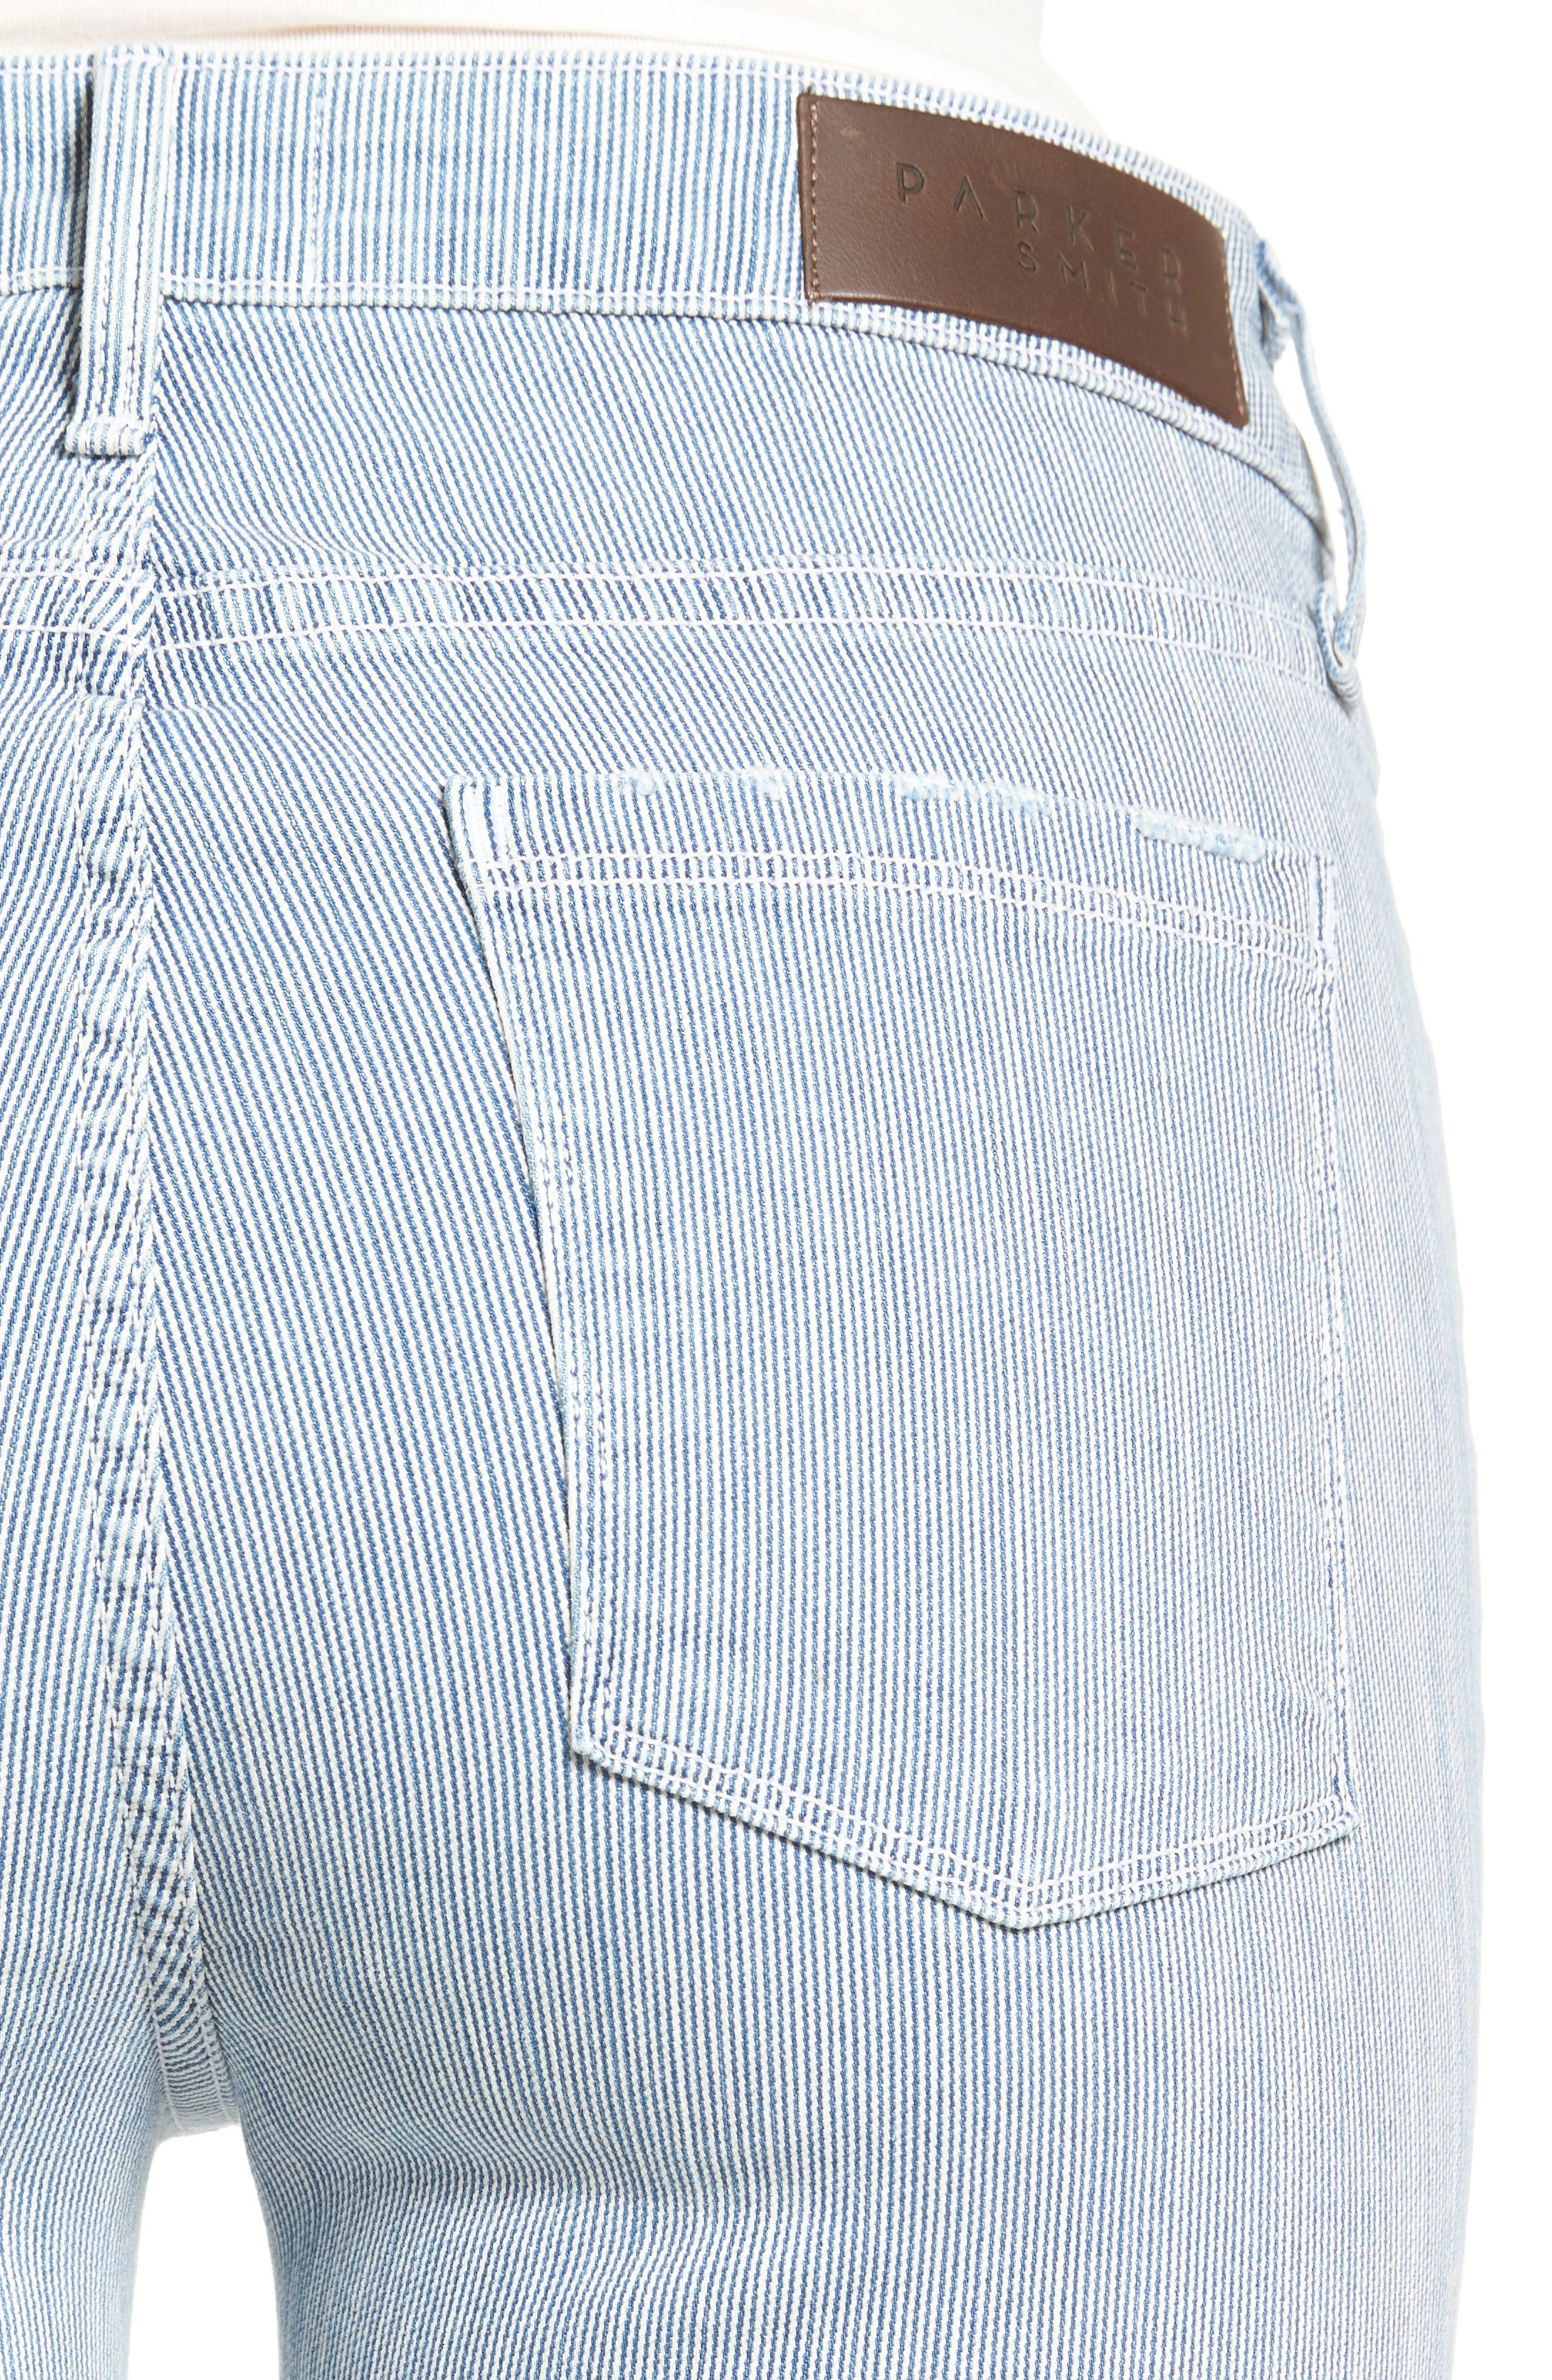 Alternate Image 4  - PARKER SMITH Ava Railroad Stripe Skinny Jeans (Engineer)